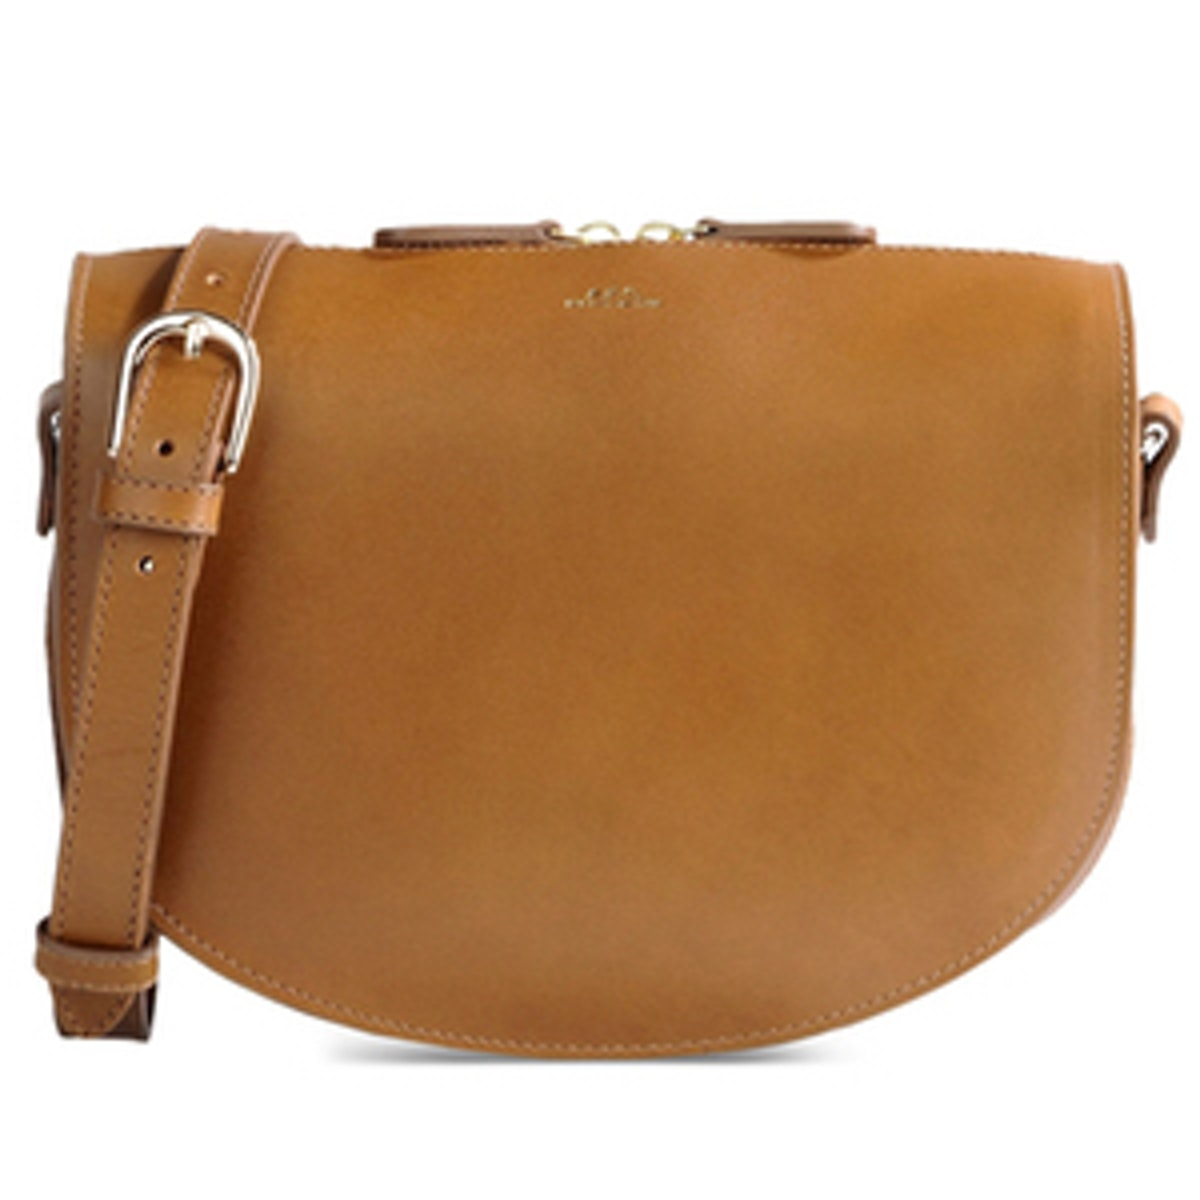 Medium Leather Bag